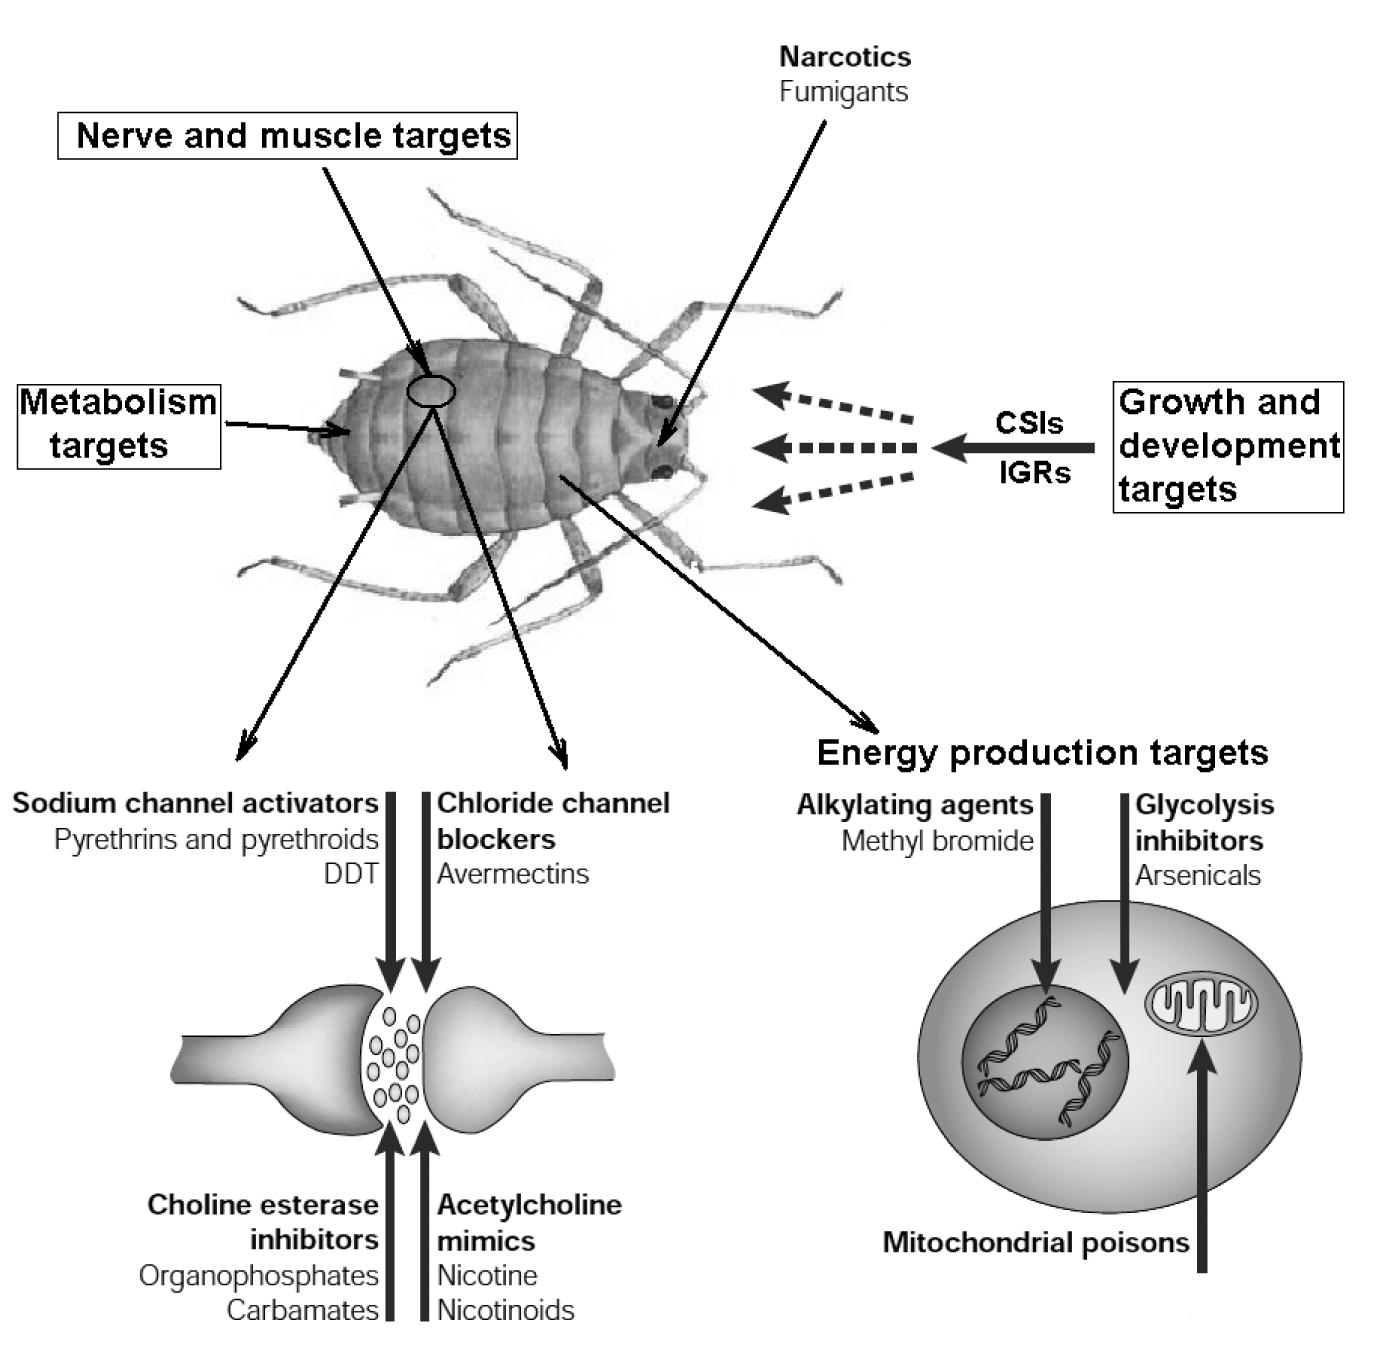 ciprofloxacin side effects pediatric